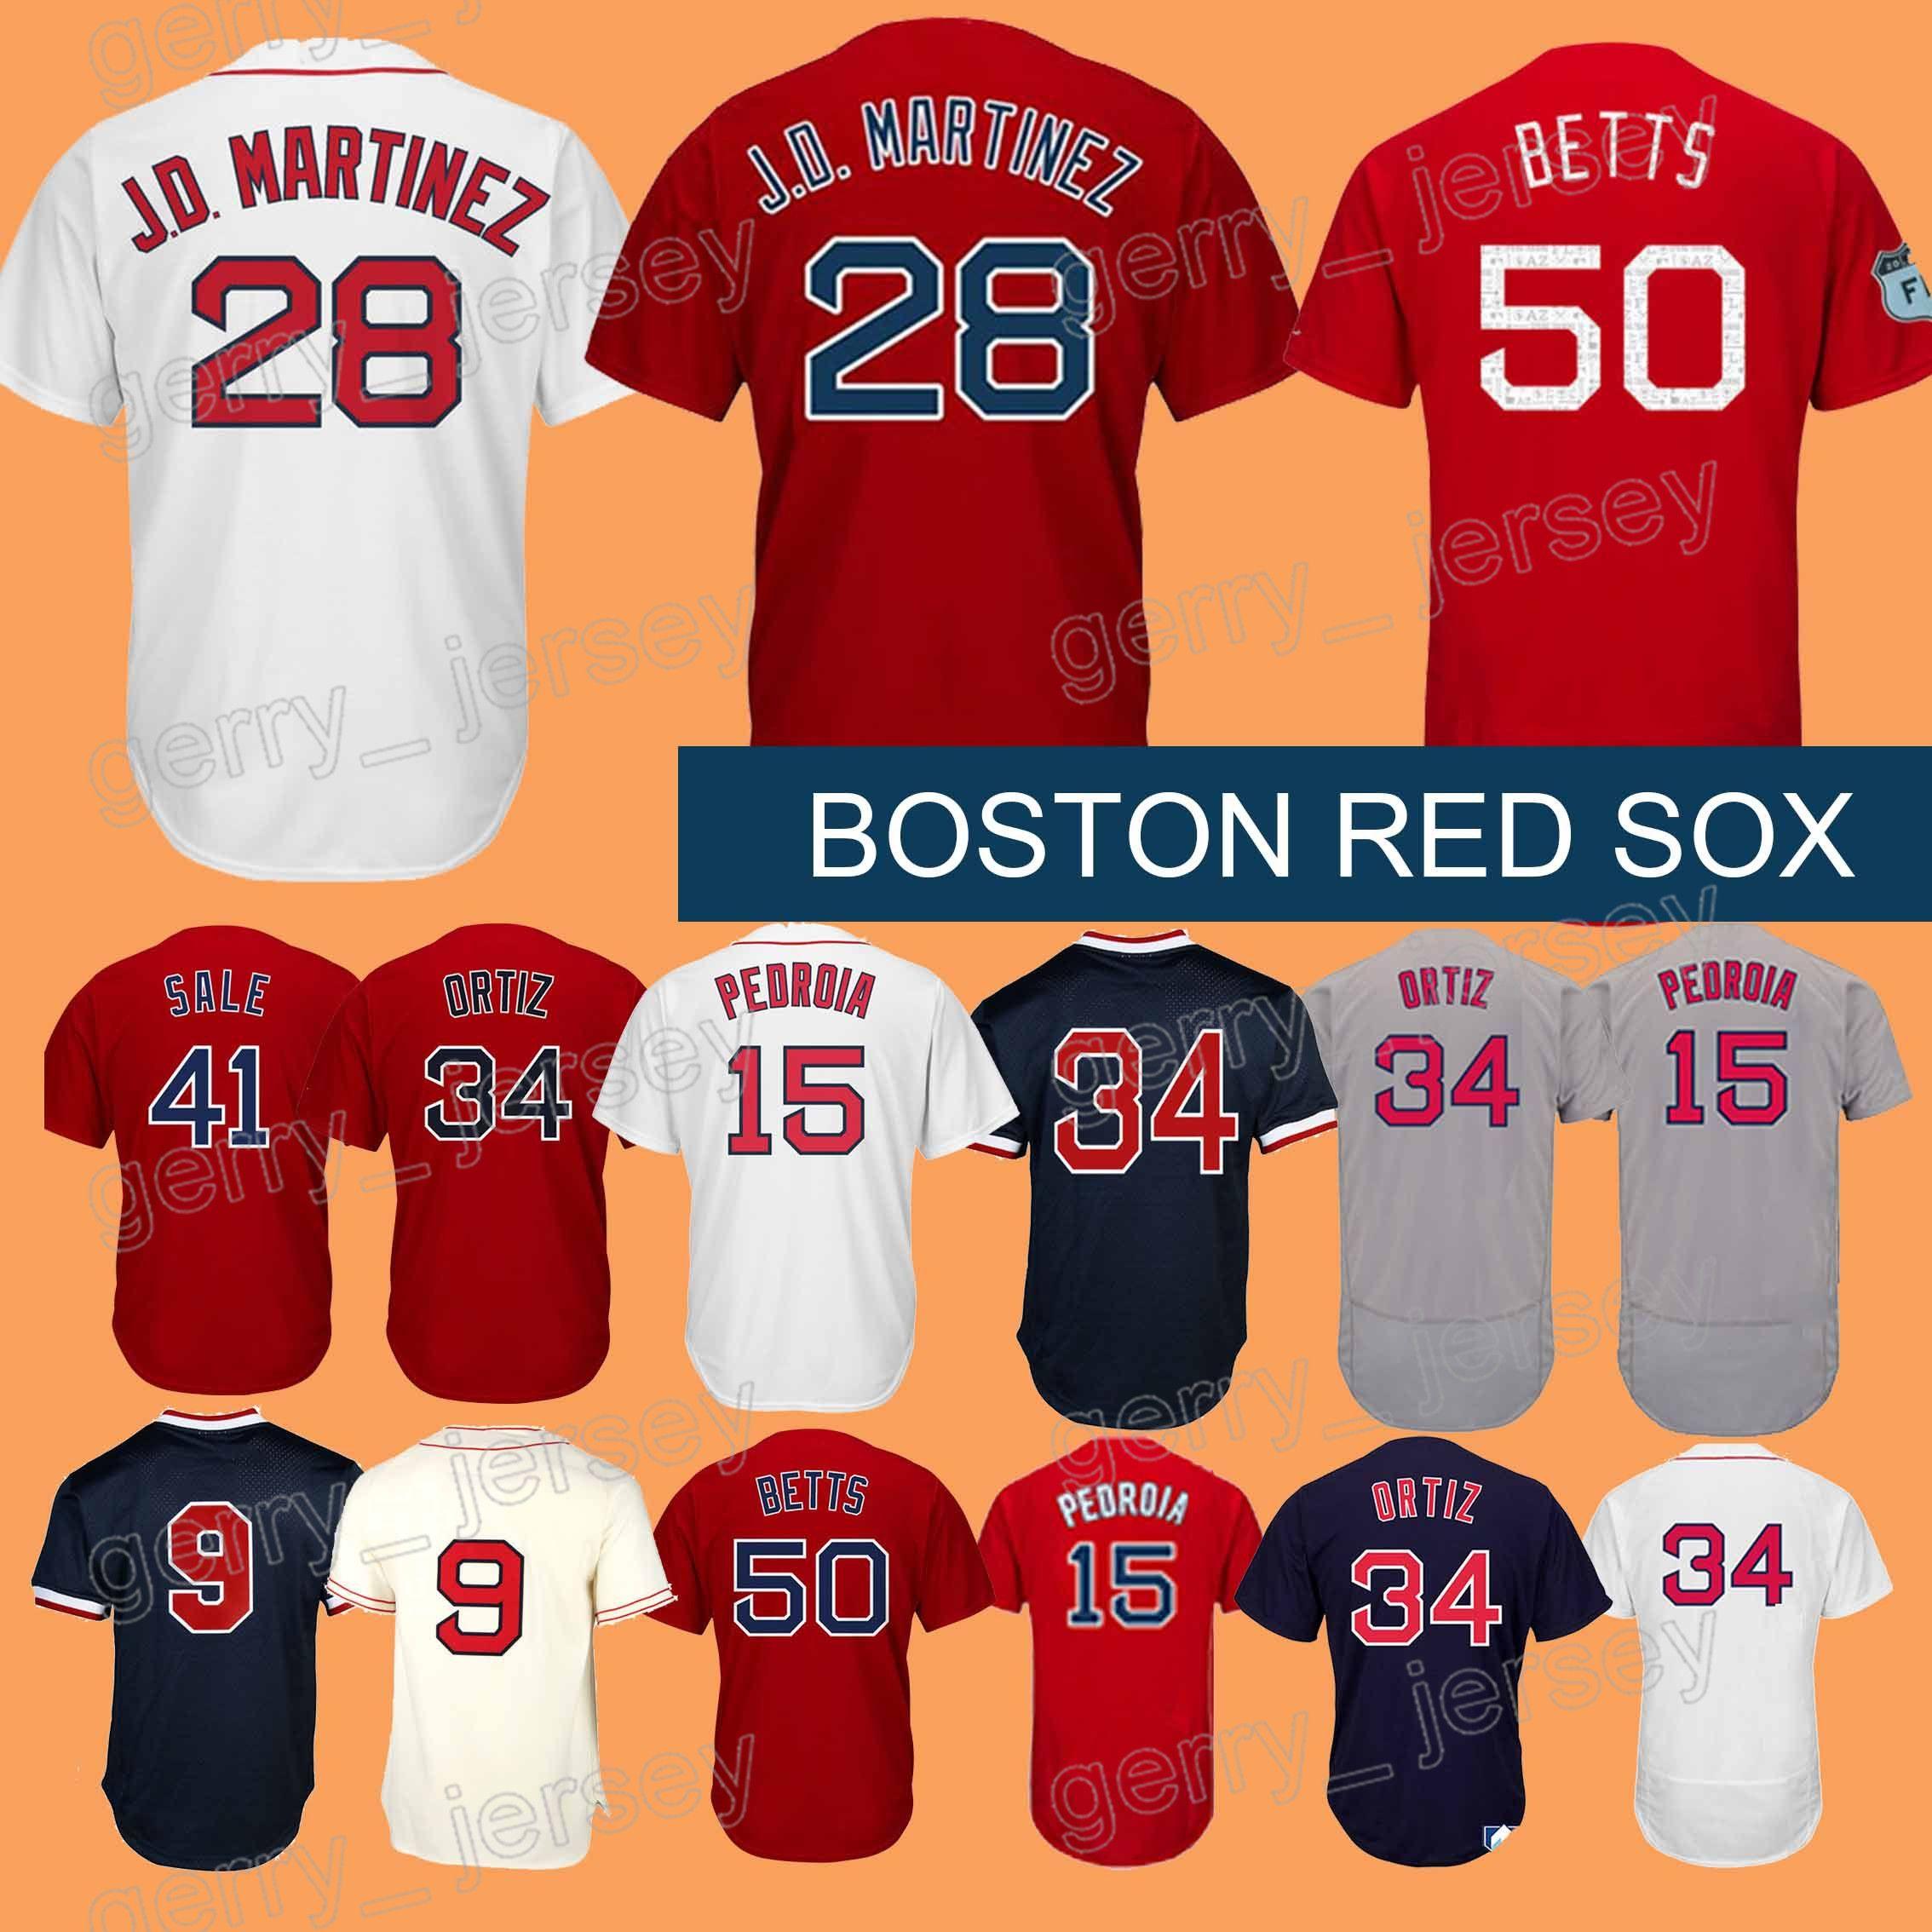 9ae8bc4f9f6 Boston Red Sox T Shirt Jersey - BCD Tofu House